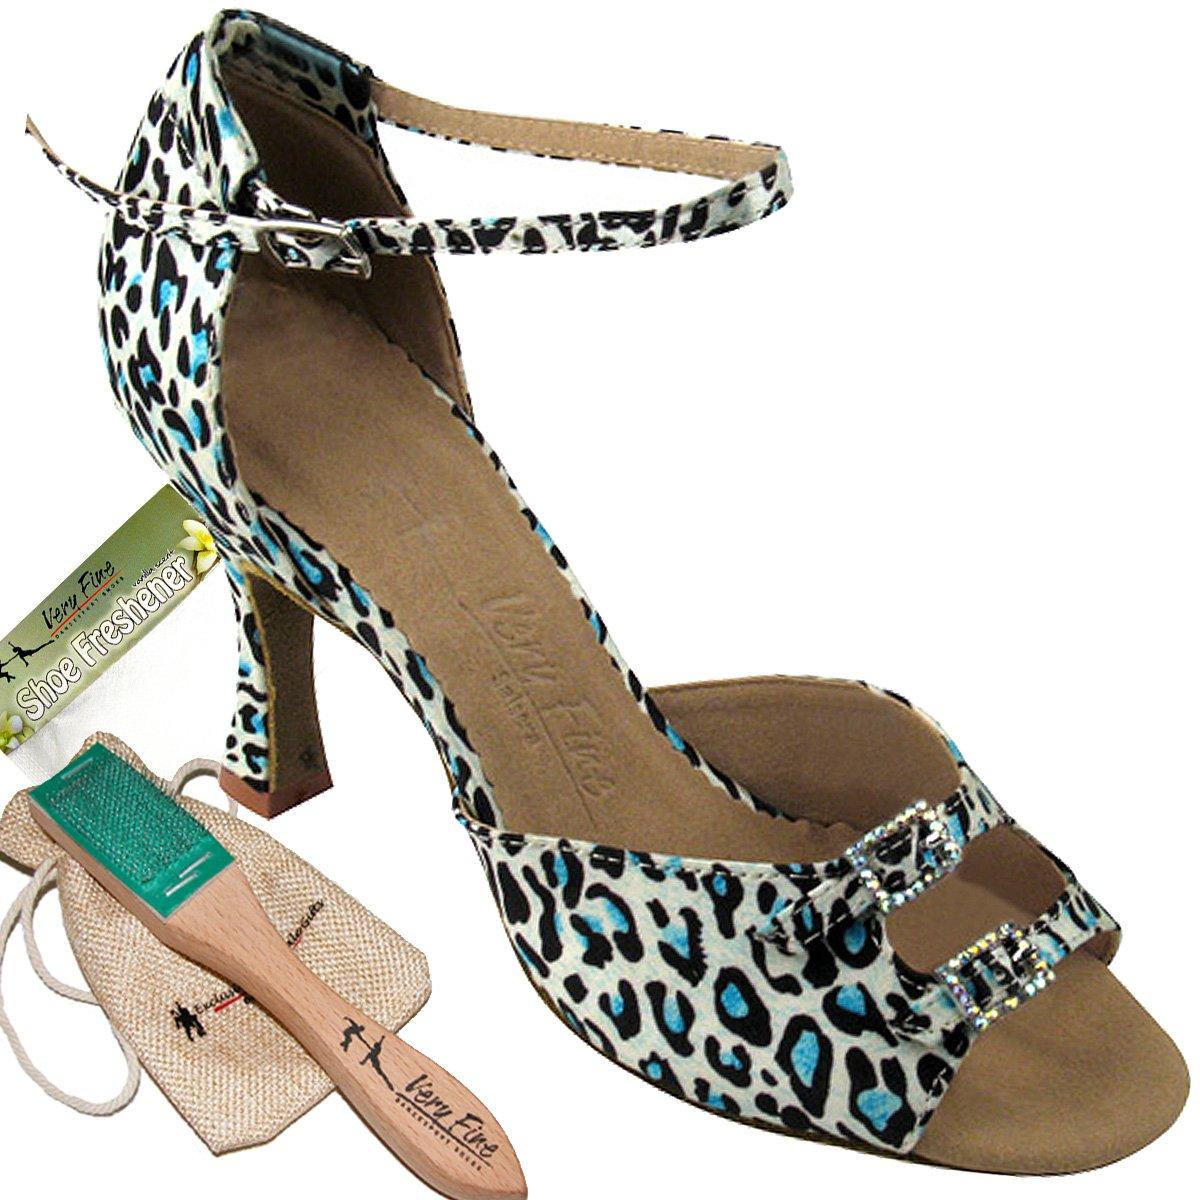 Women's Ballroom Dance Shoes Tango Wedding Salsa Dance Shoes Blue Leopard Sera1620BEB Comfortable - Very Fine 3'' Heel 7.5 M US [Bundle 5]